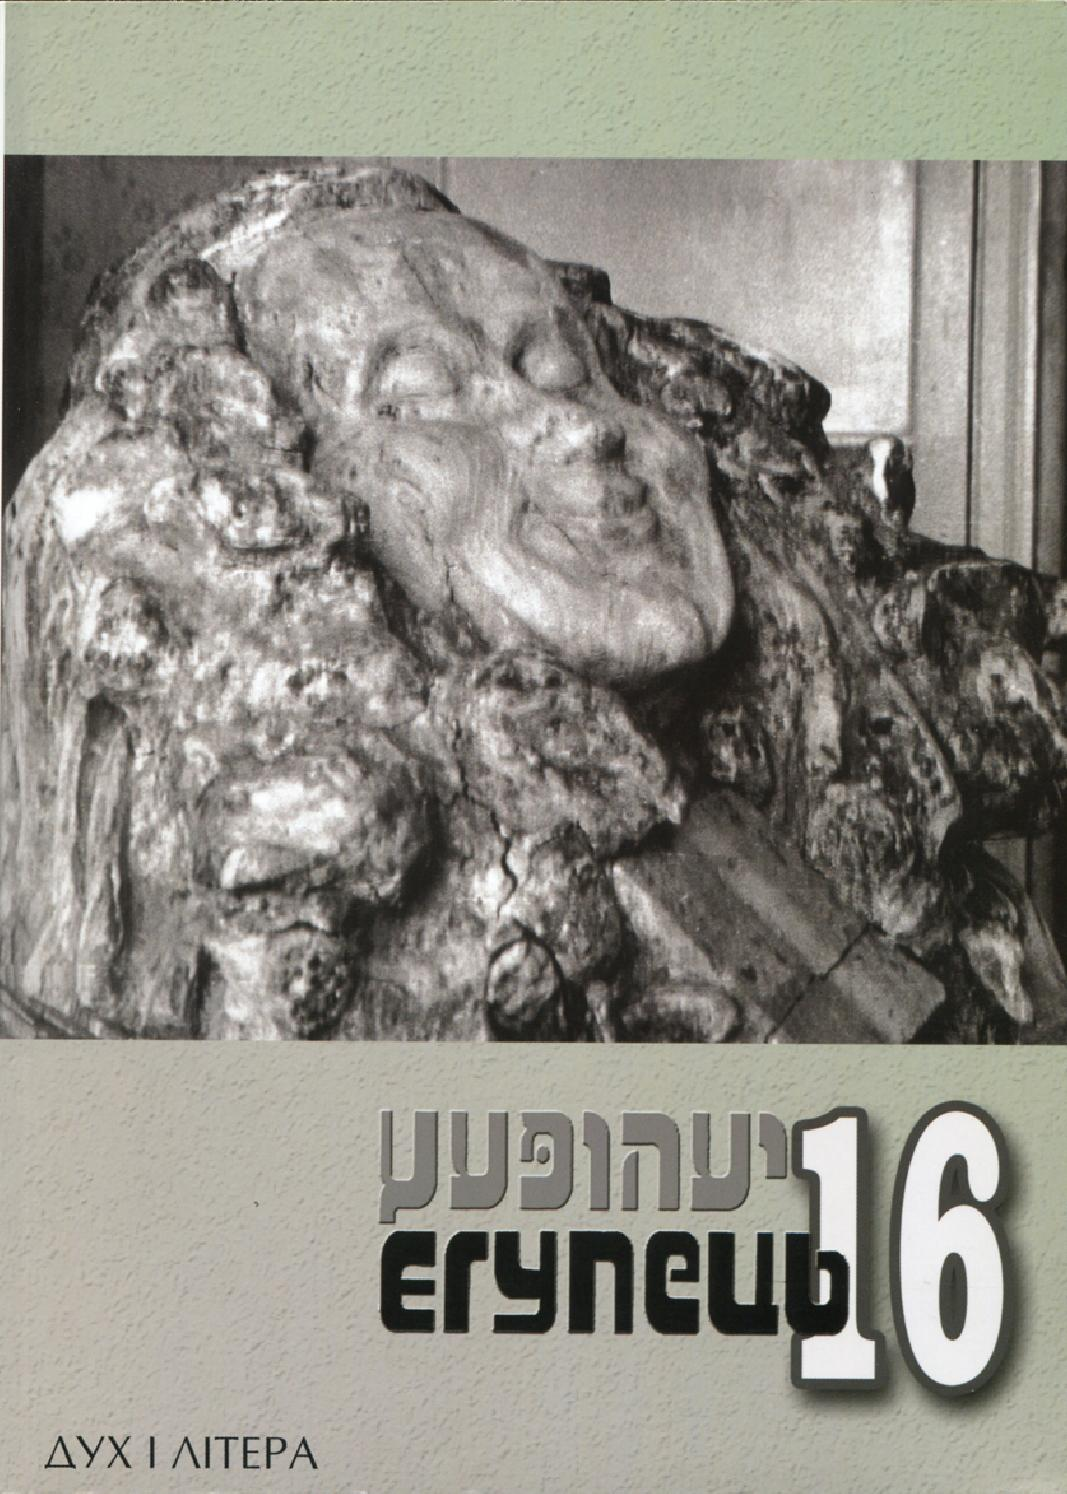 Єгупець №16 by Judaica Center - issuu 39a818c5015d8